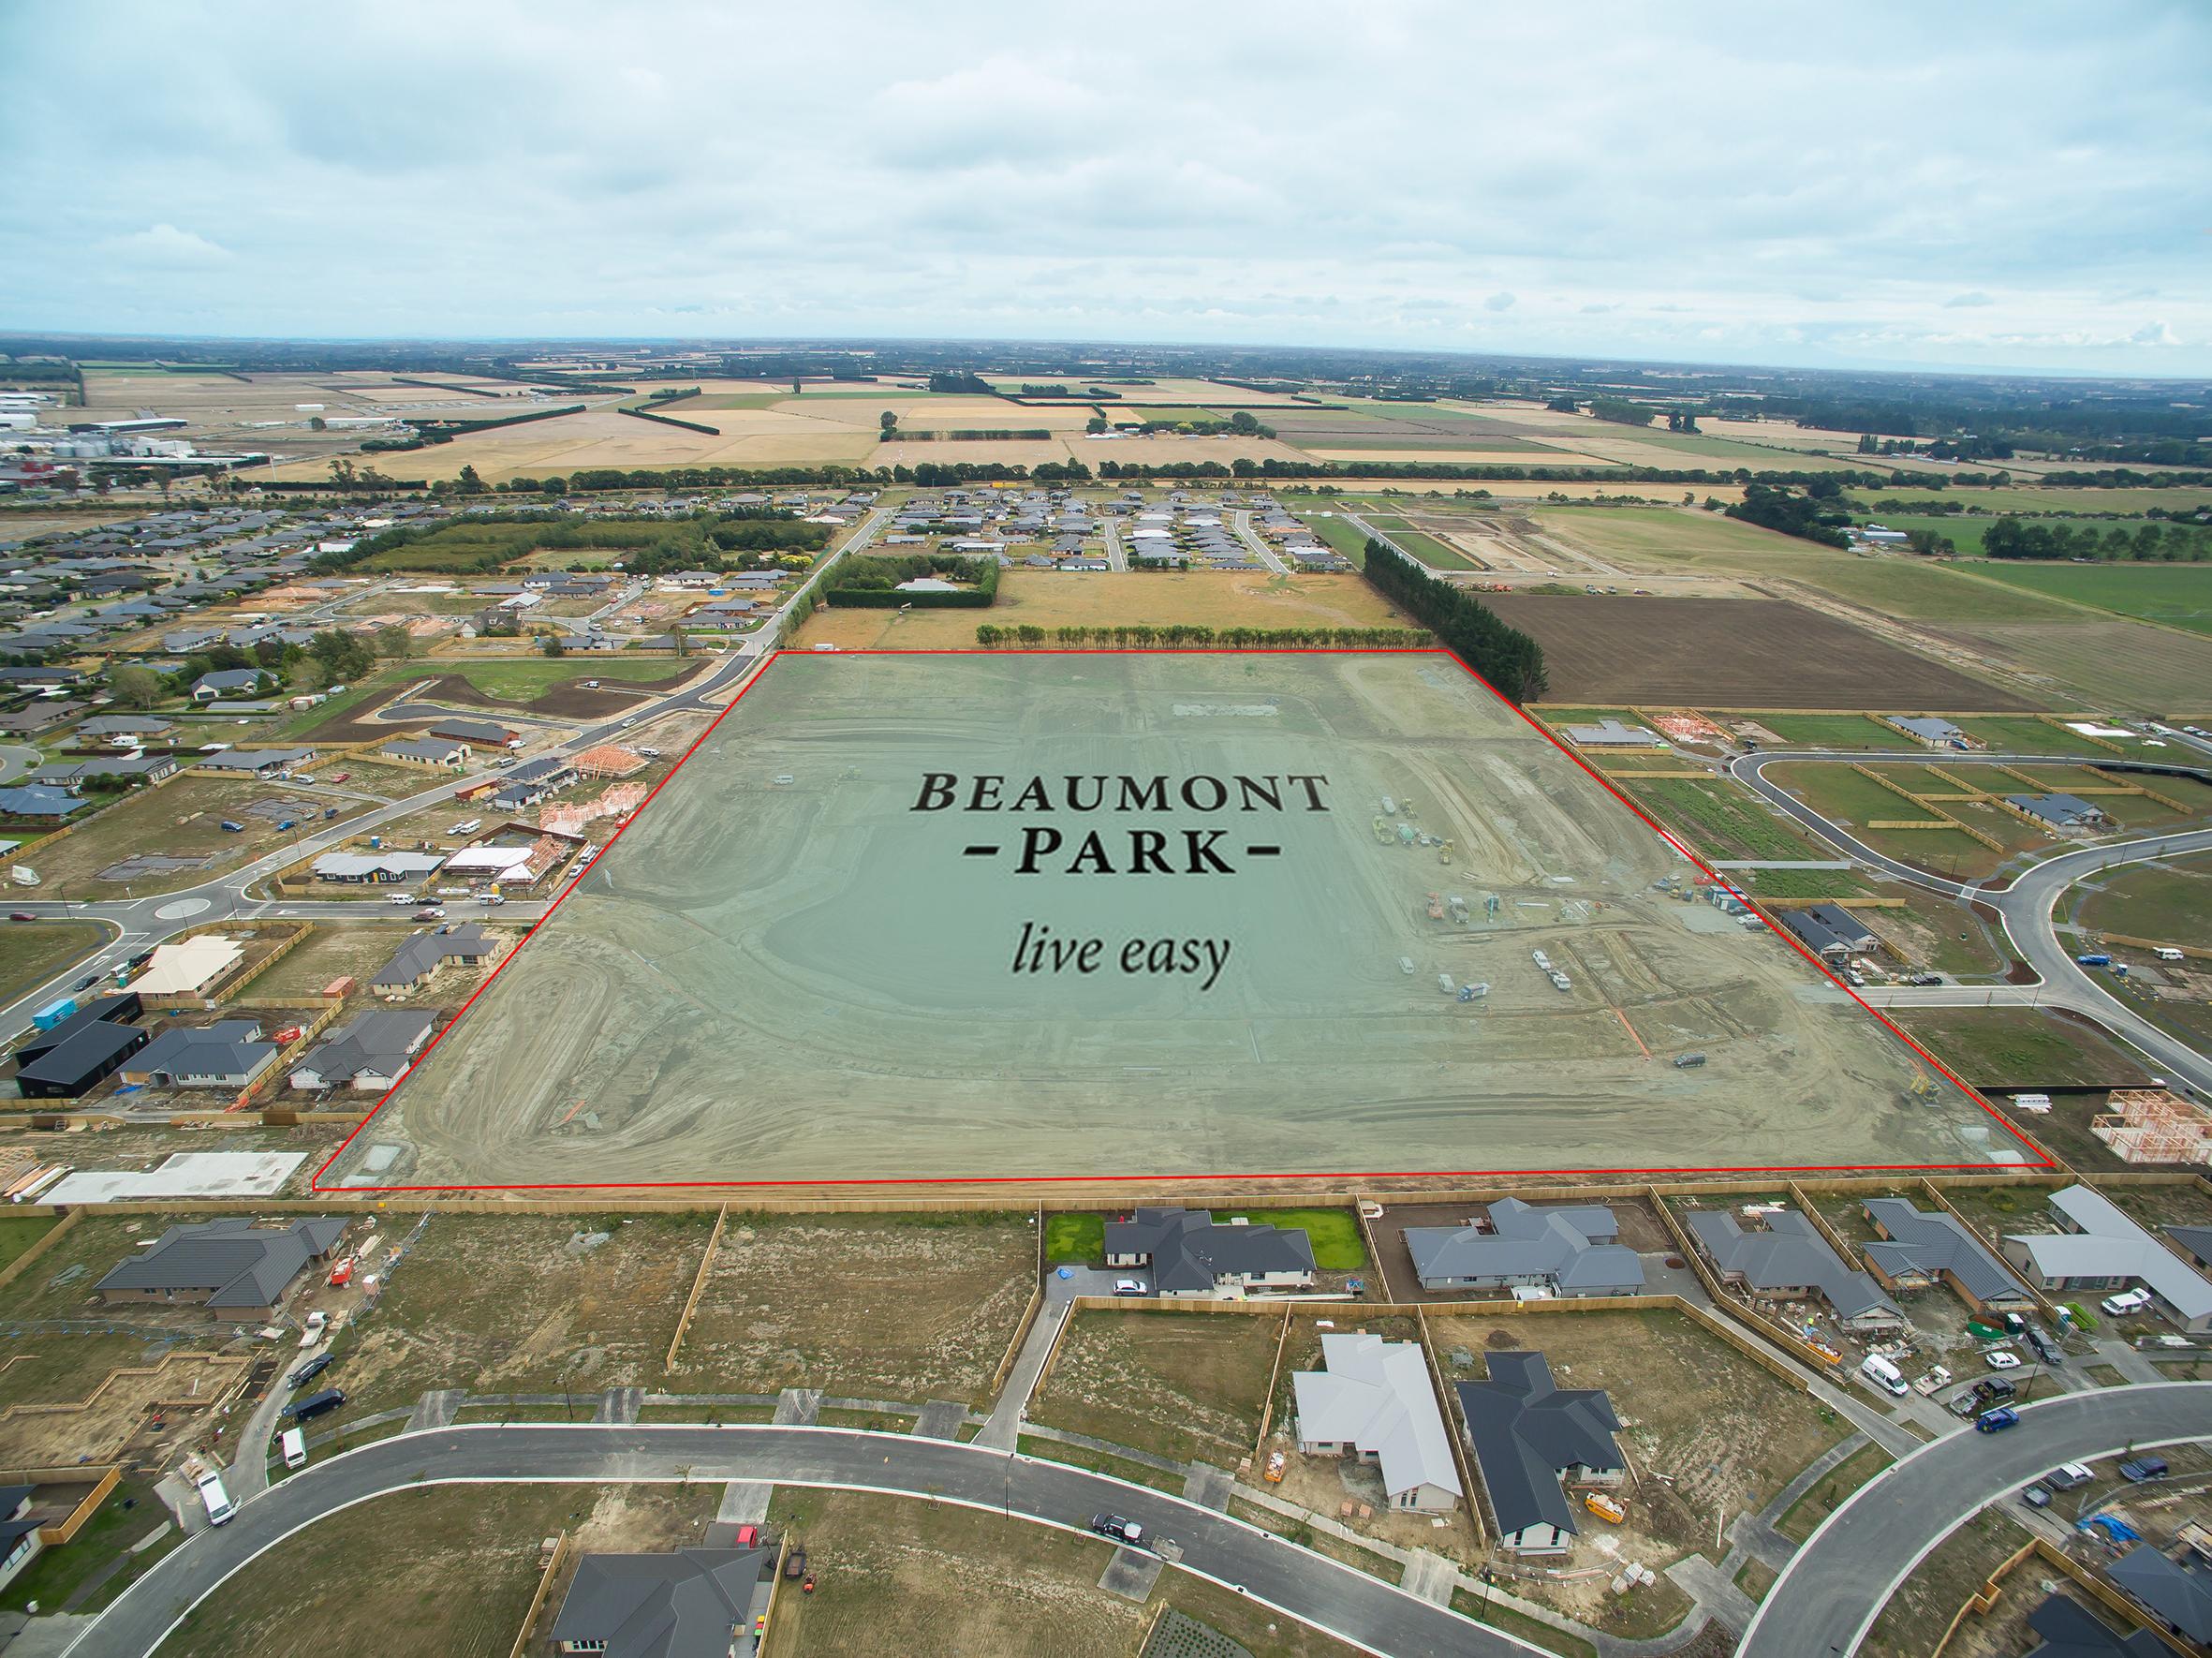 Aerial_Beaumont Park_DJI_0029 v2.jpg